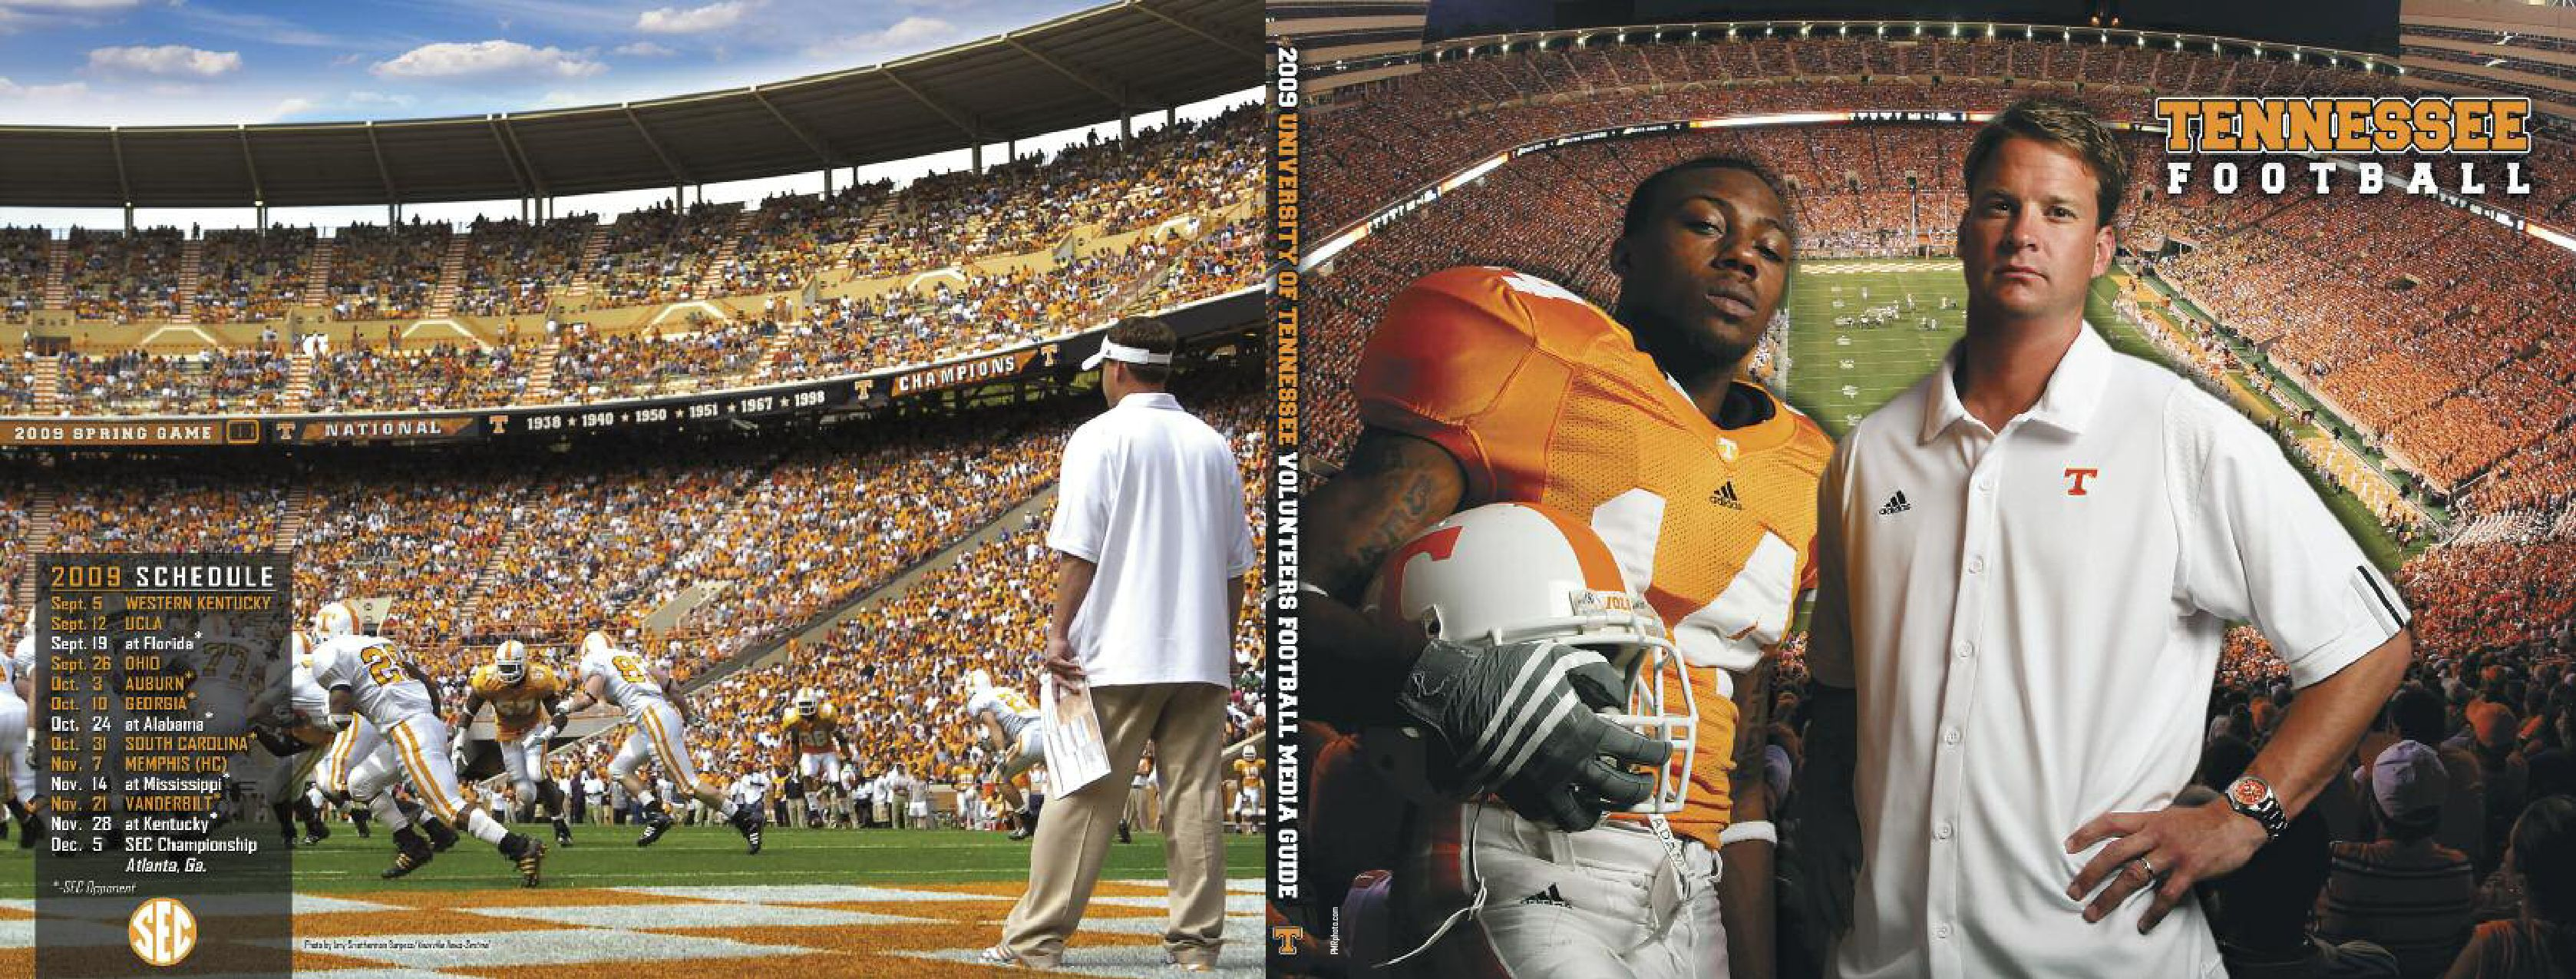 2009 Tennessee Volunteers Football Media Guide By Jeff